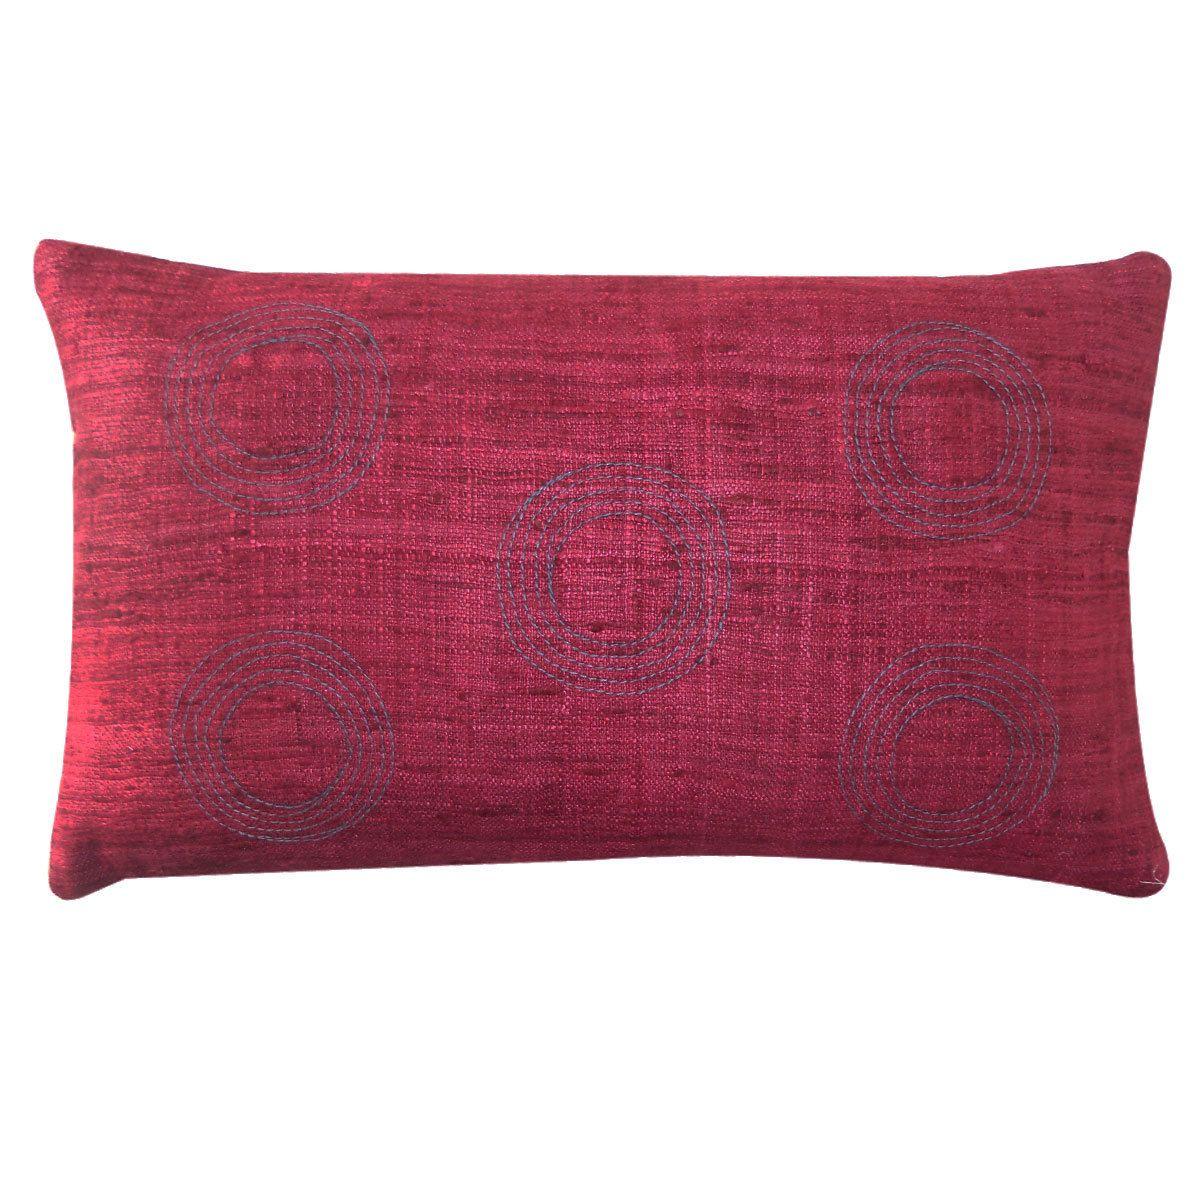 Red Sofa Pillows Euro Bed Costco Matka Center Decorative Throw Pillow Overstock